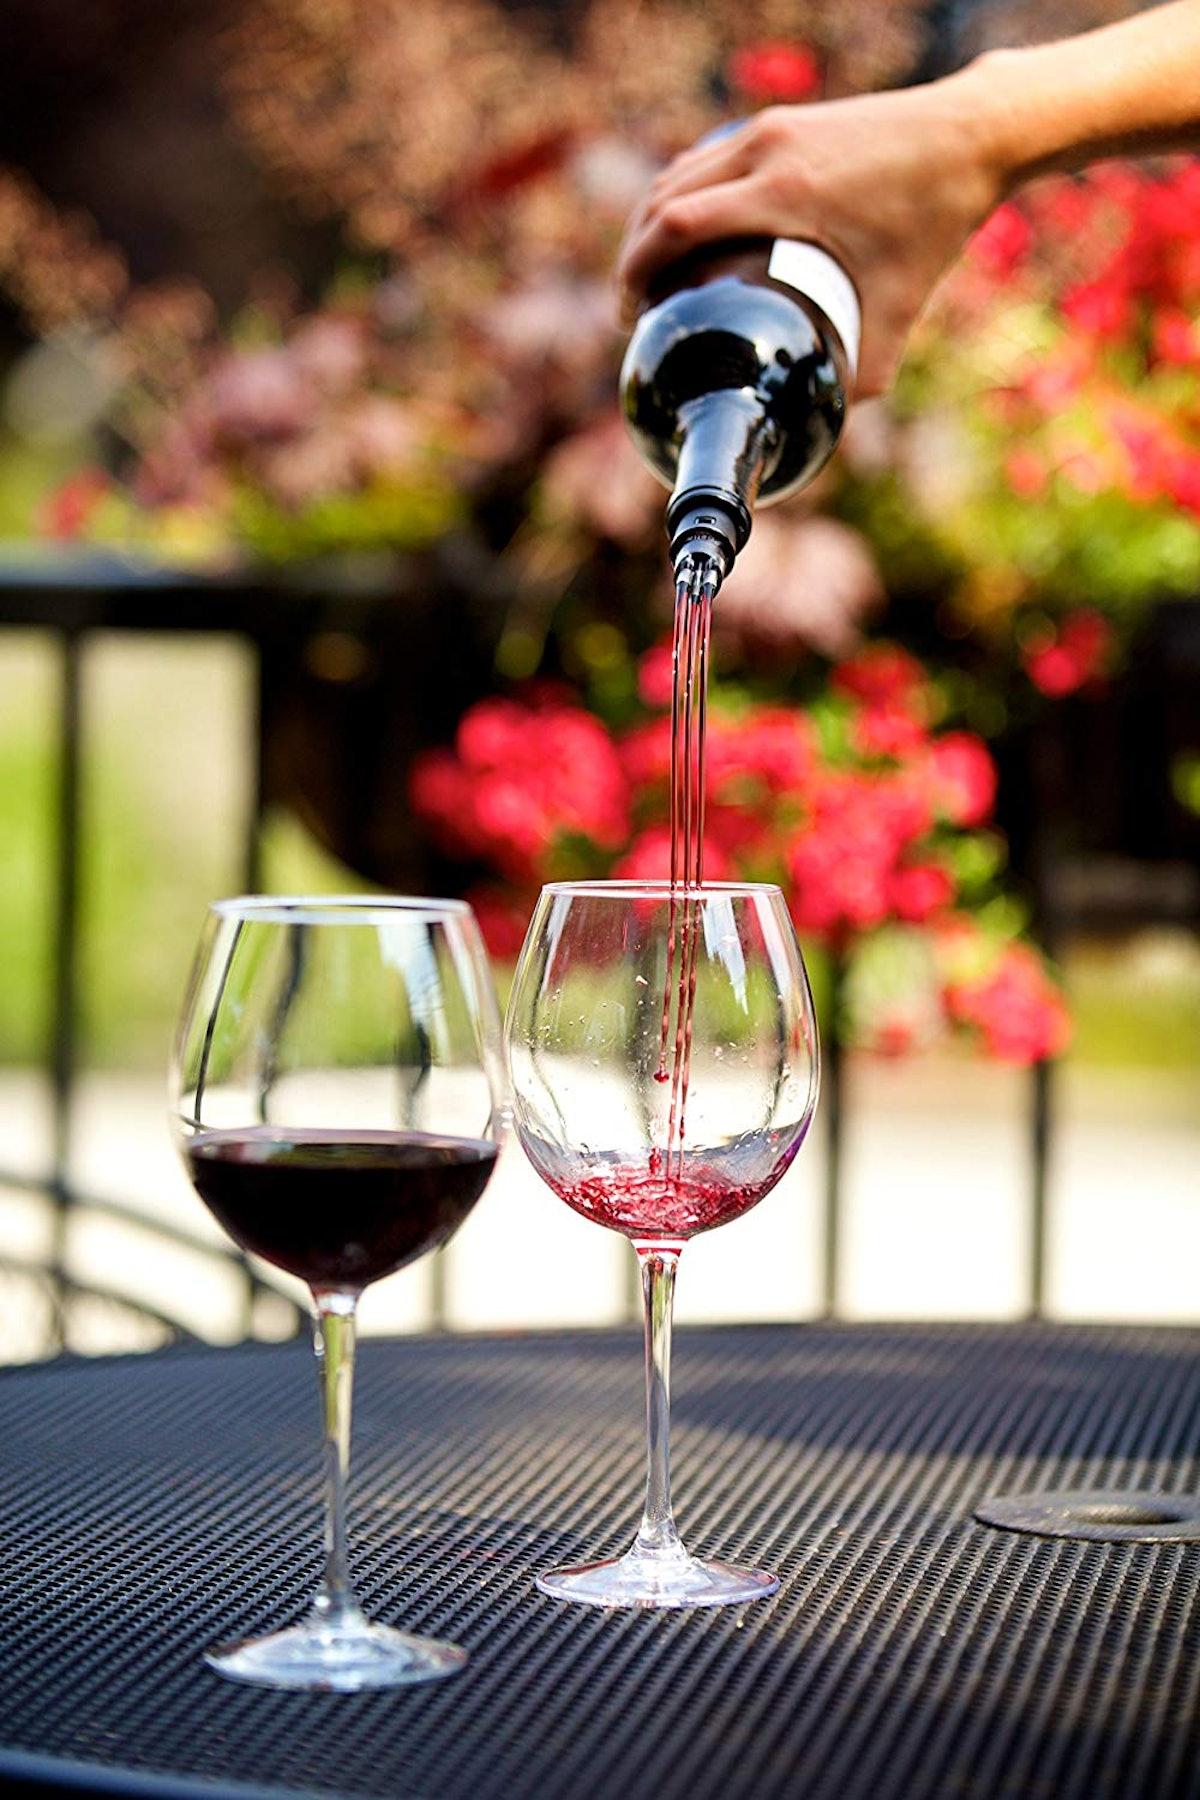 TRIbella Classic Drip-Free Wine Aerator